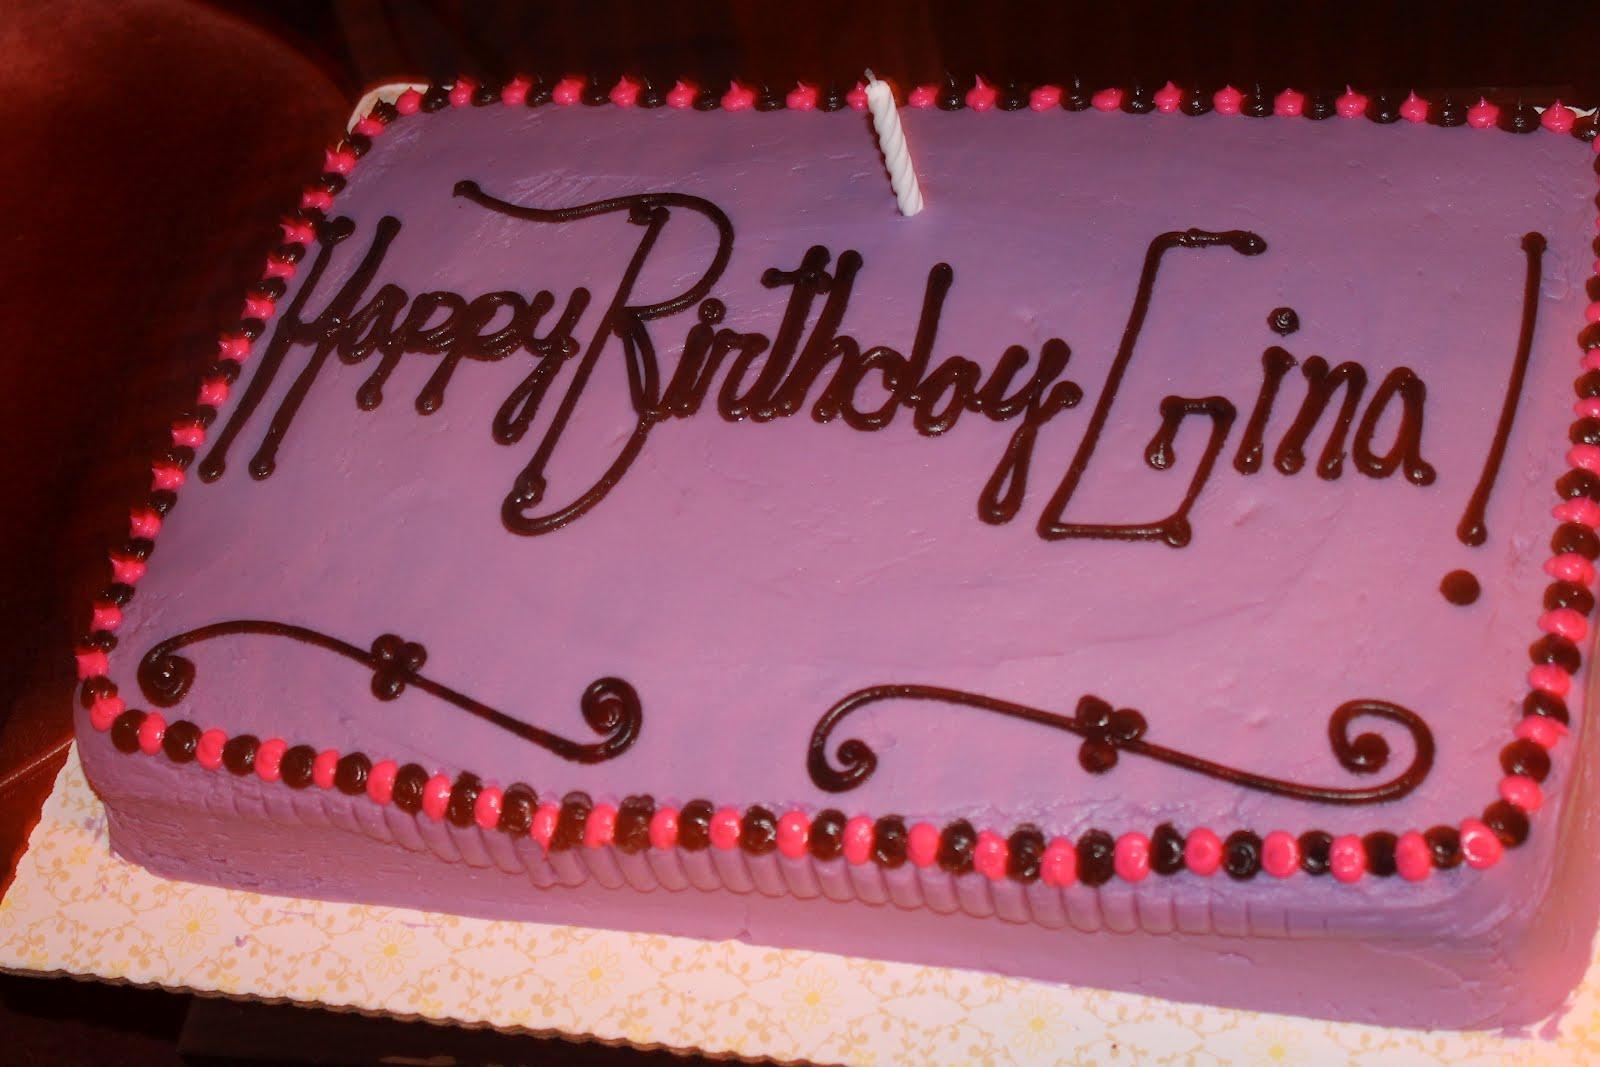 Getting Fat With Nat Happy Birthday Gina Round 1